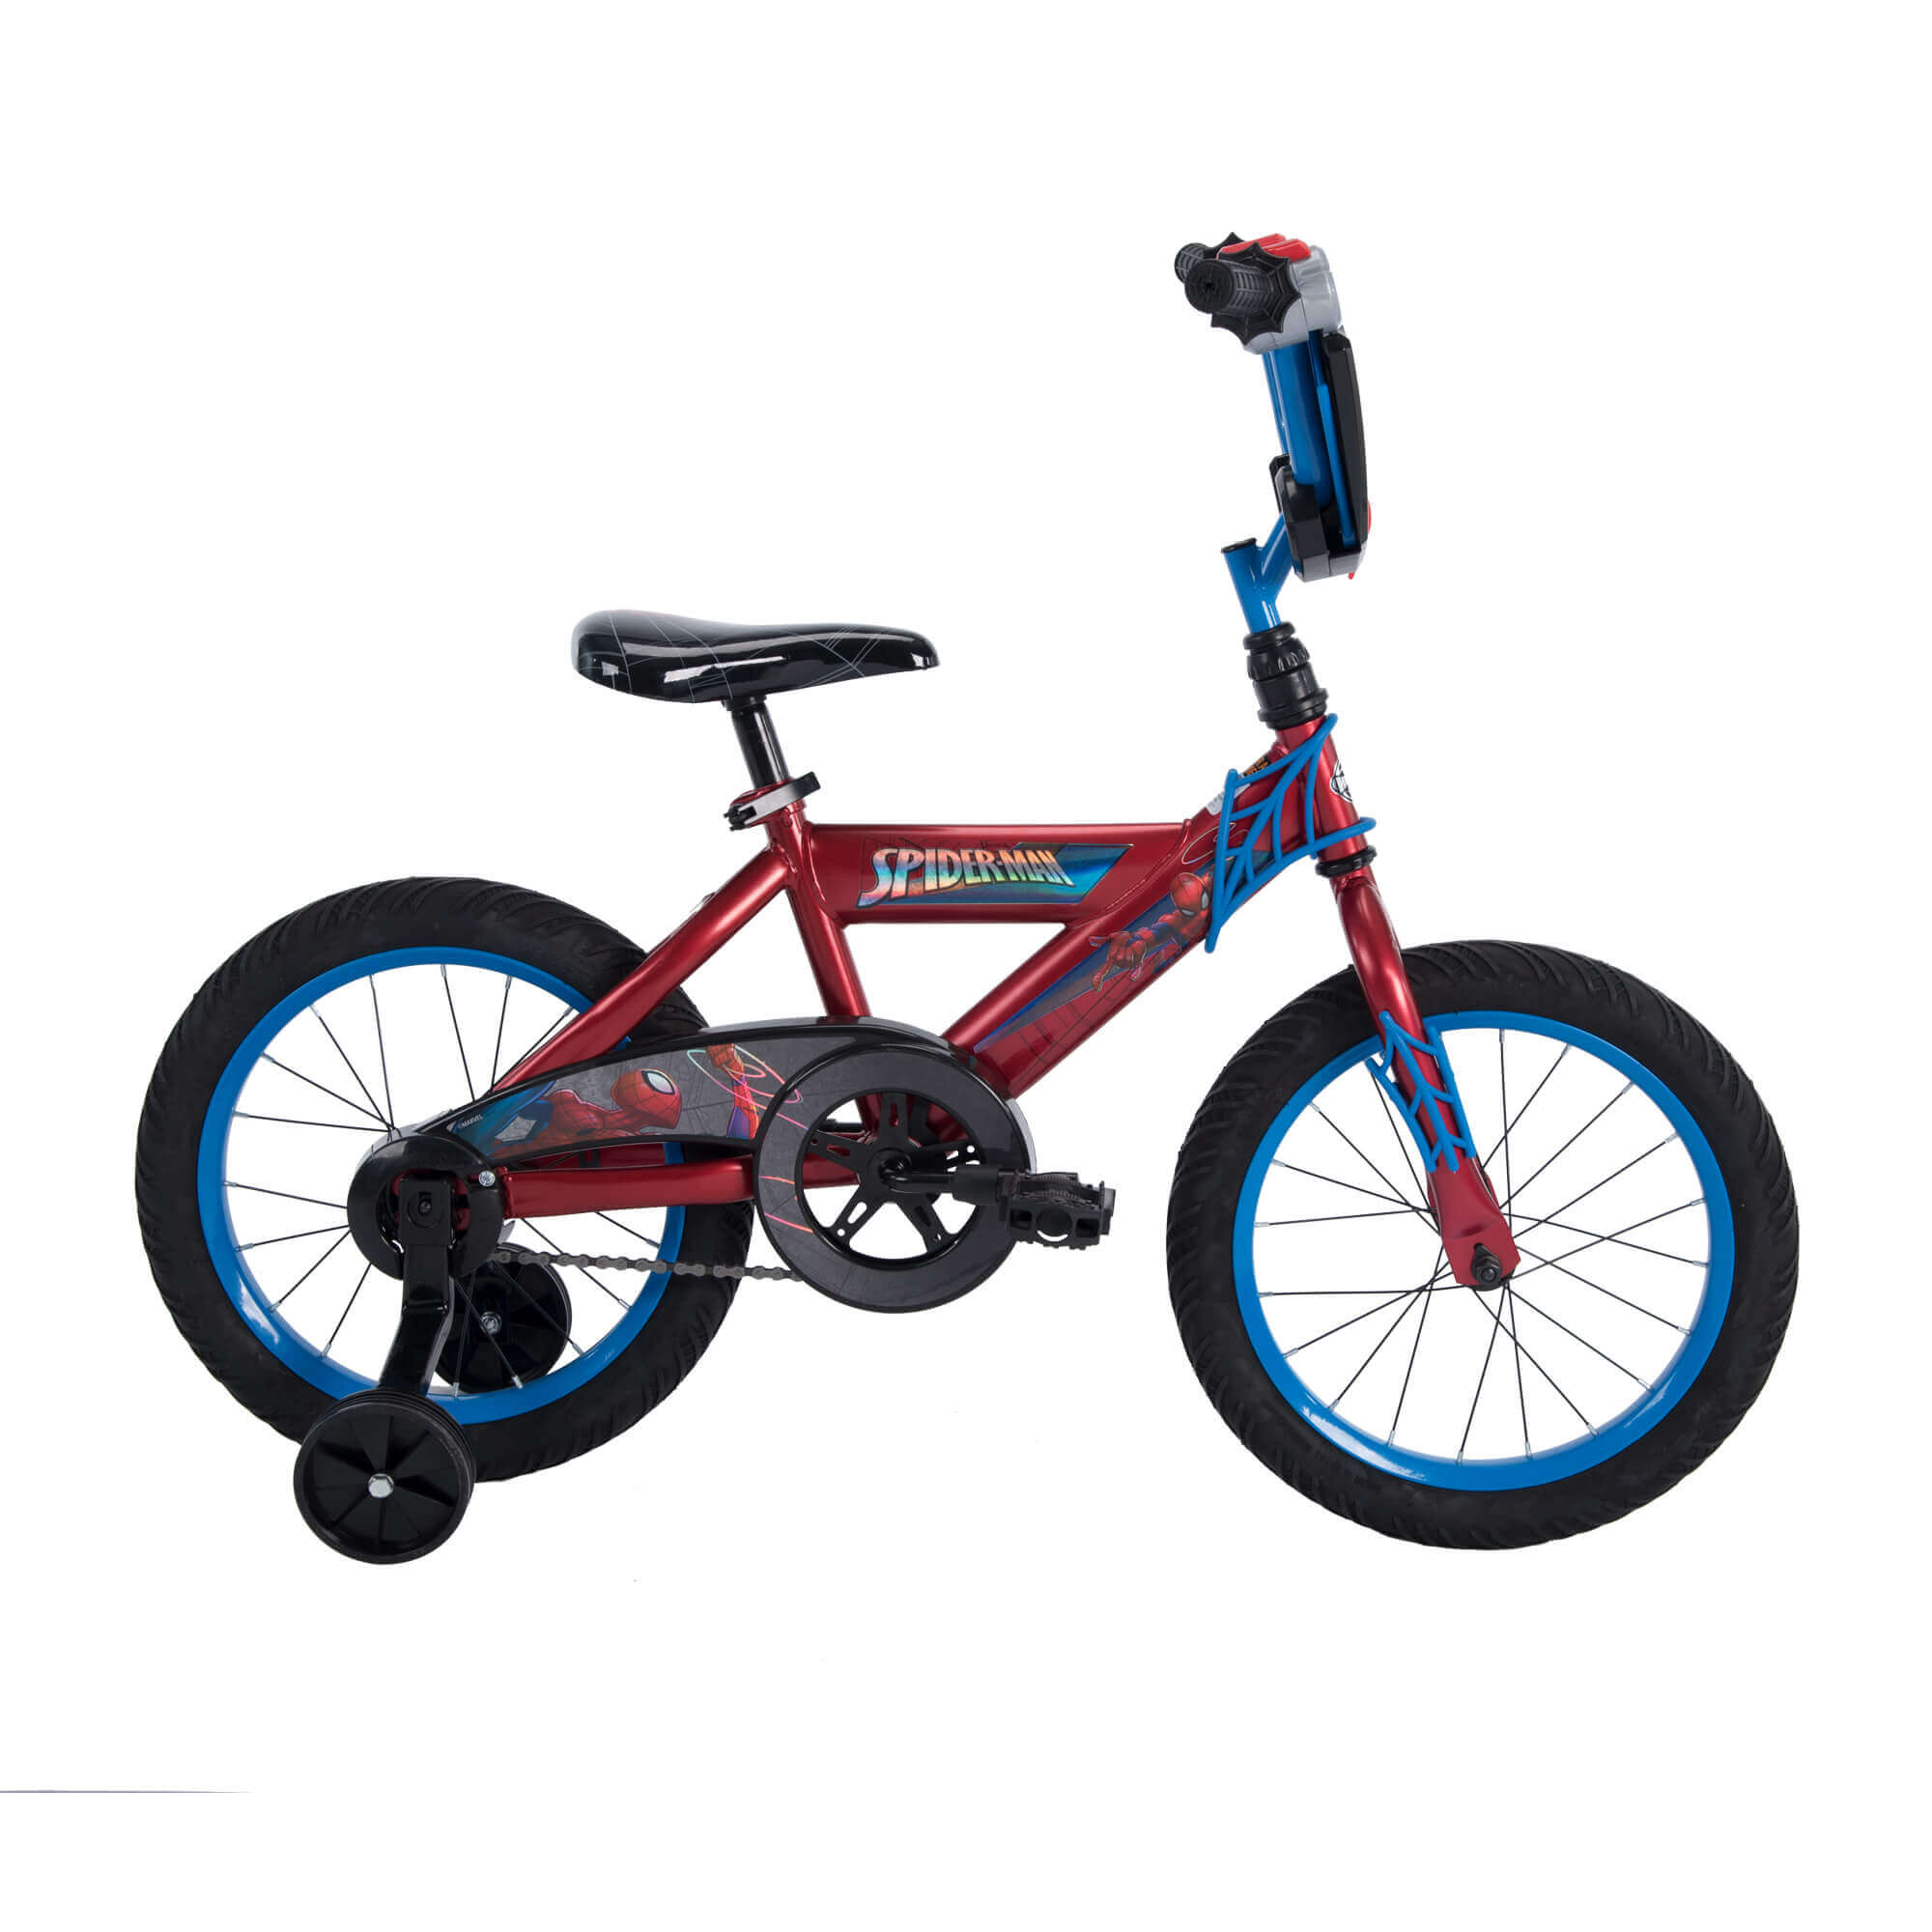 Marvel Spider Man 16 Ez Build Red Bike By Huffy Walmartcom